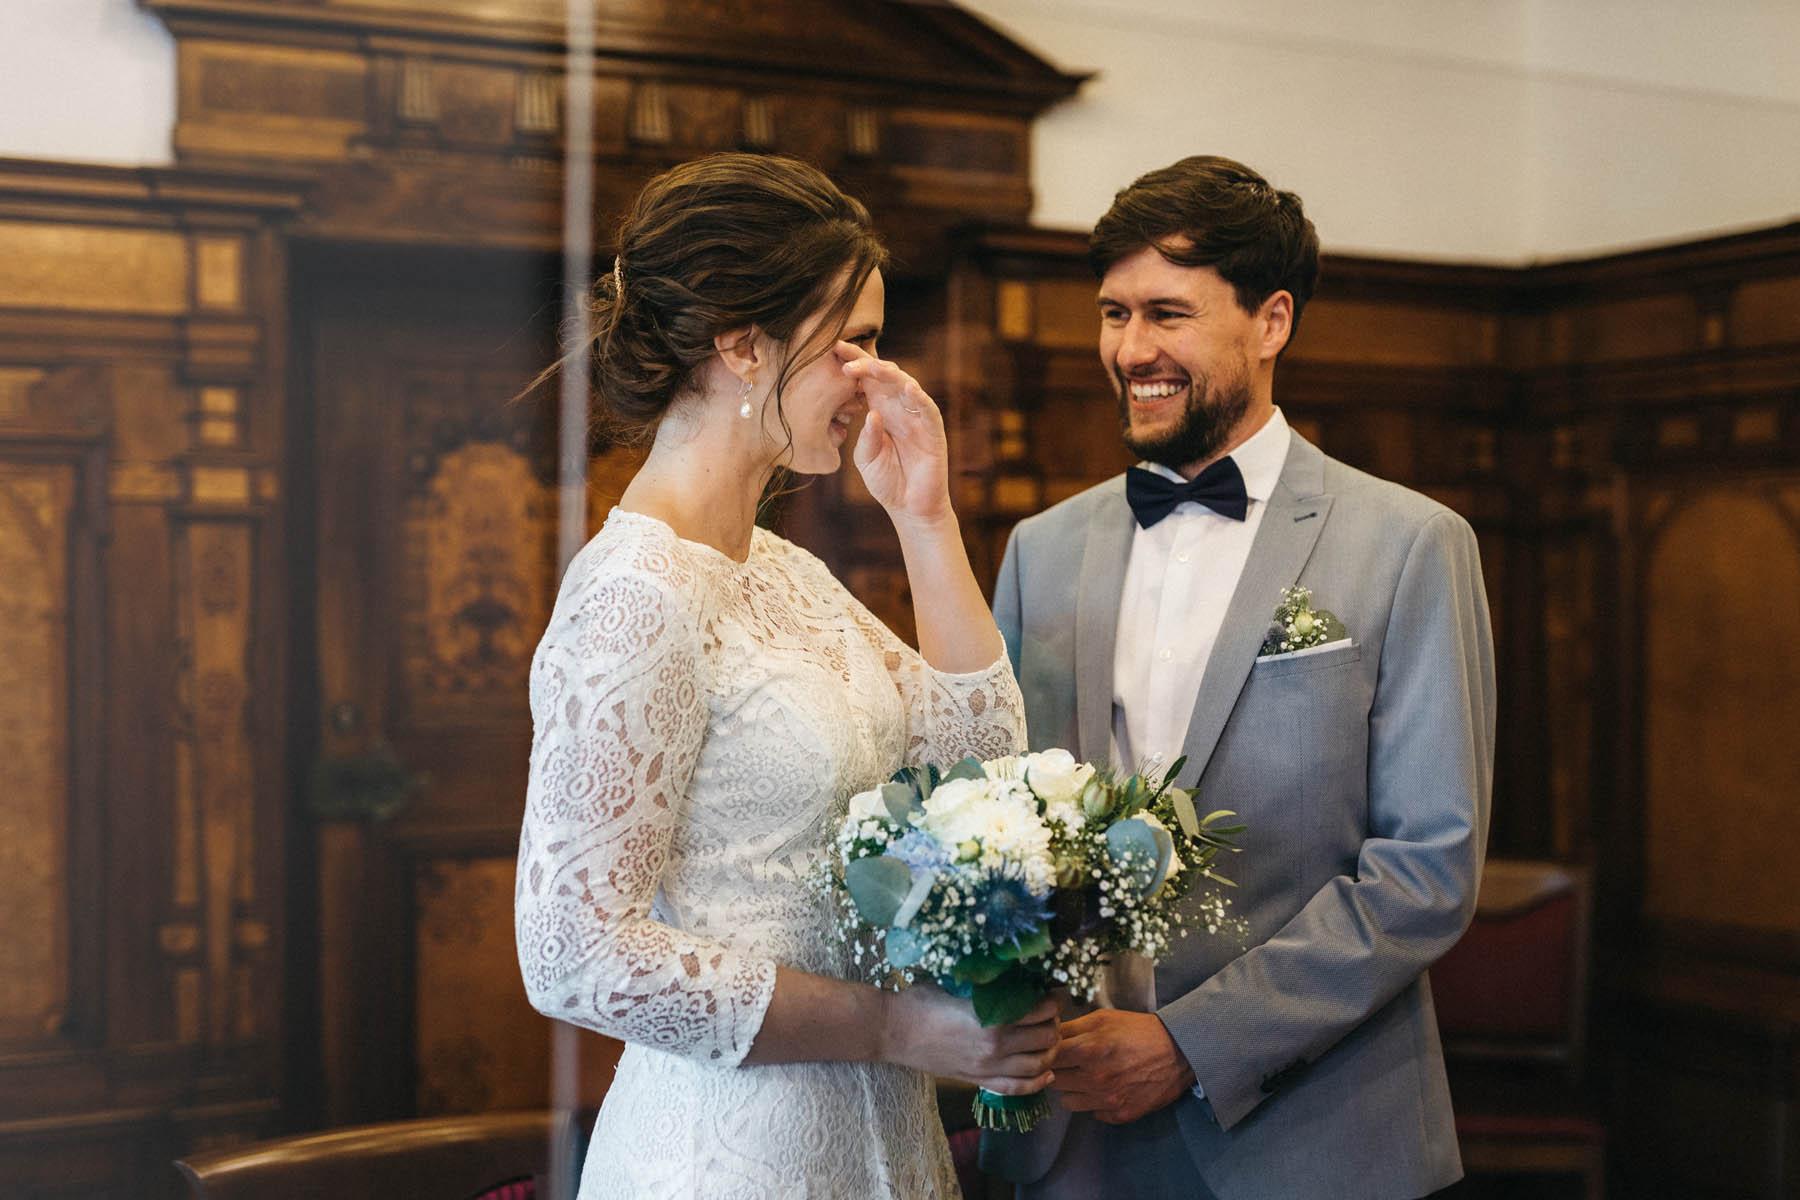 raissa simon fotografie elopement freiburg standesamt 012 - Julia + Tobias